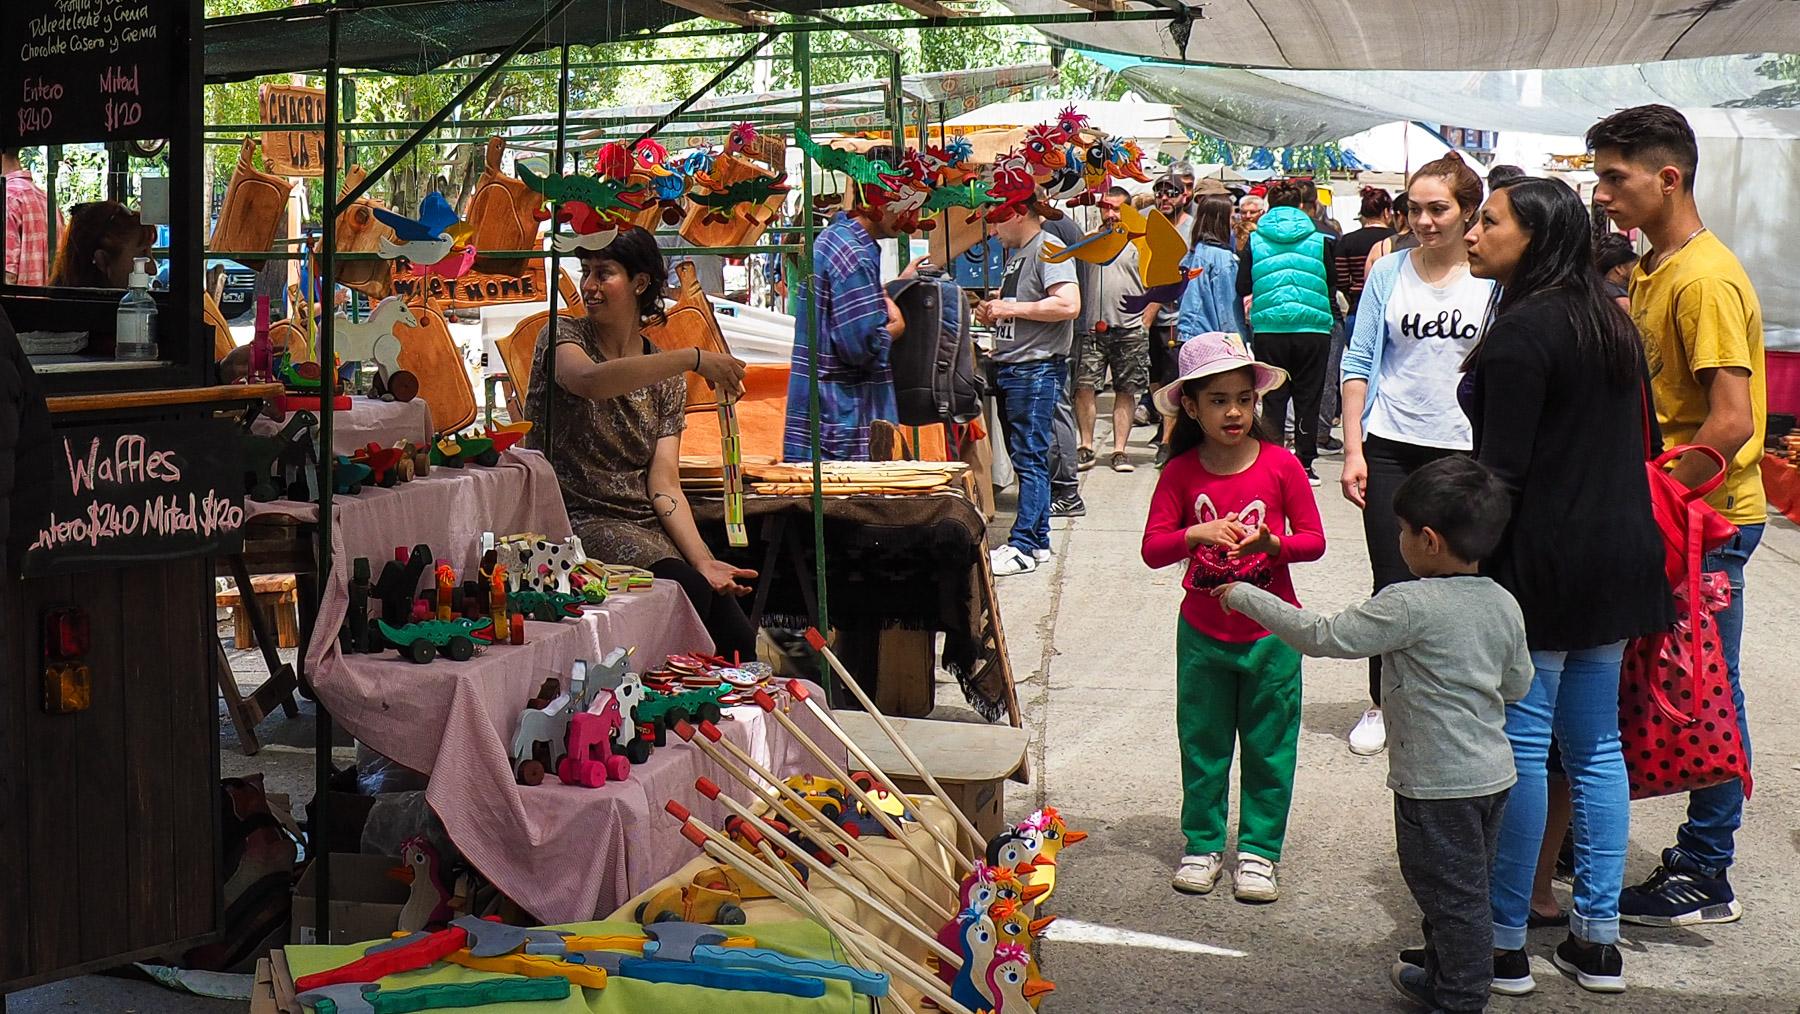 Netter Kunsthandwerksmarkt in El Bolson